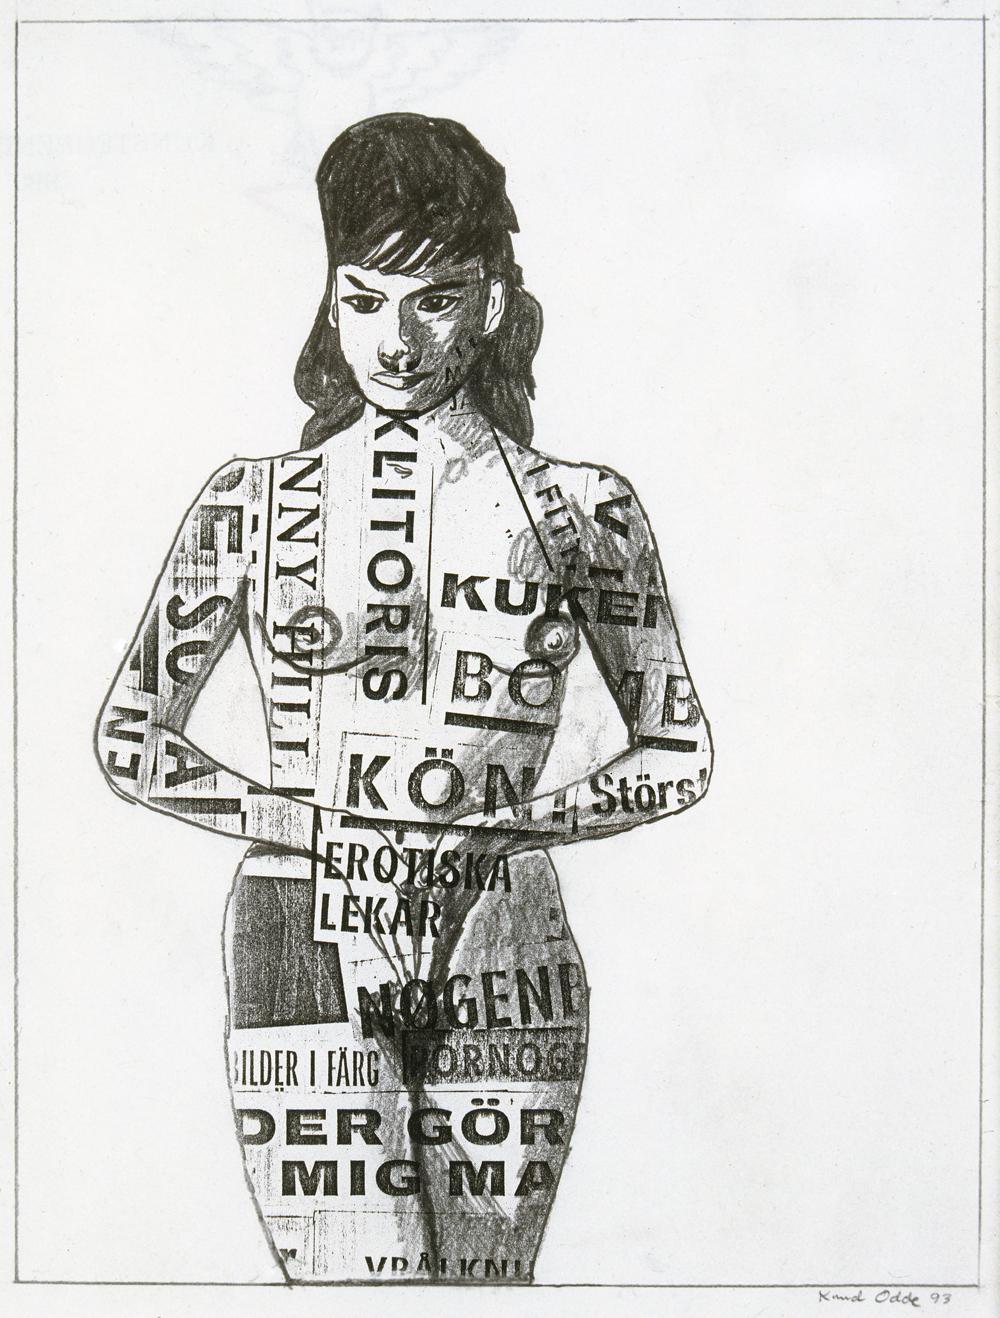 Paper_Pift_21x29,5cm_Crayon, xerox_1993